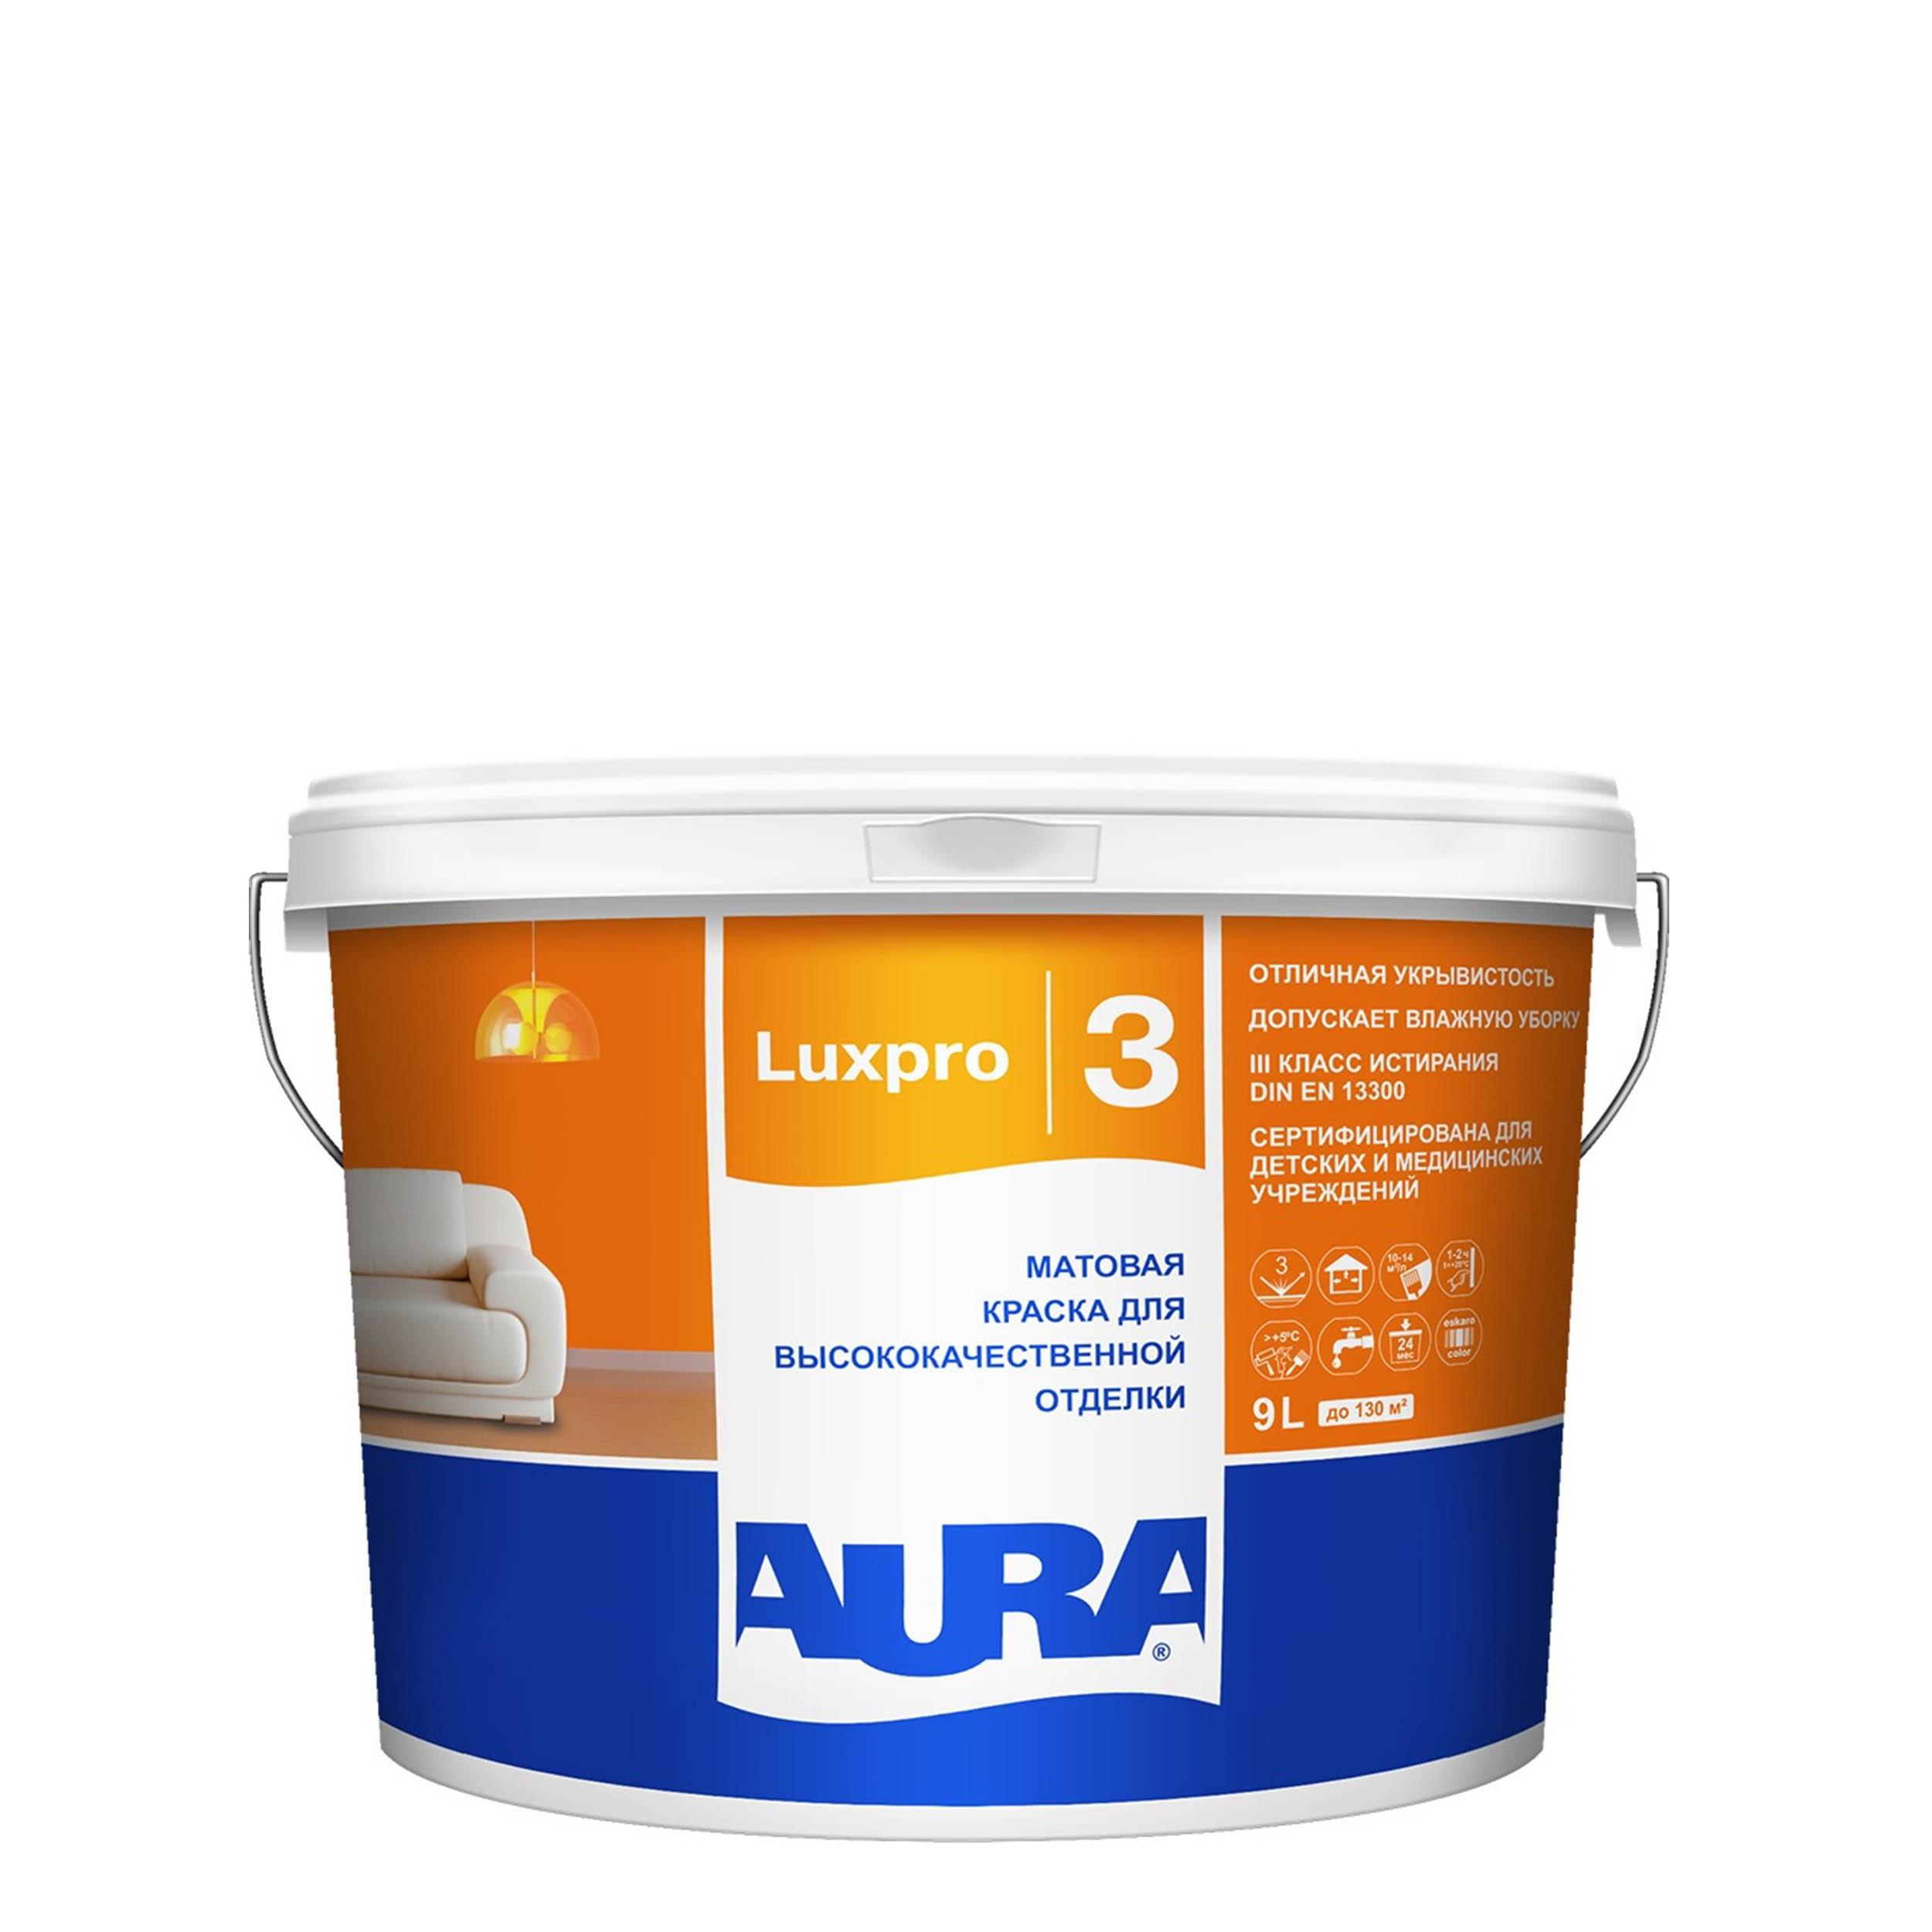 Фото 3 - Краска интерьерная, Aura LuxPRO 3, RAL 7045, 11 кг.